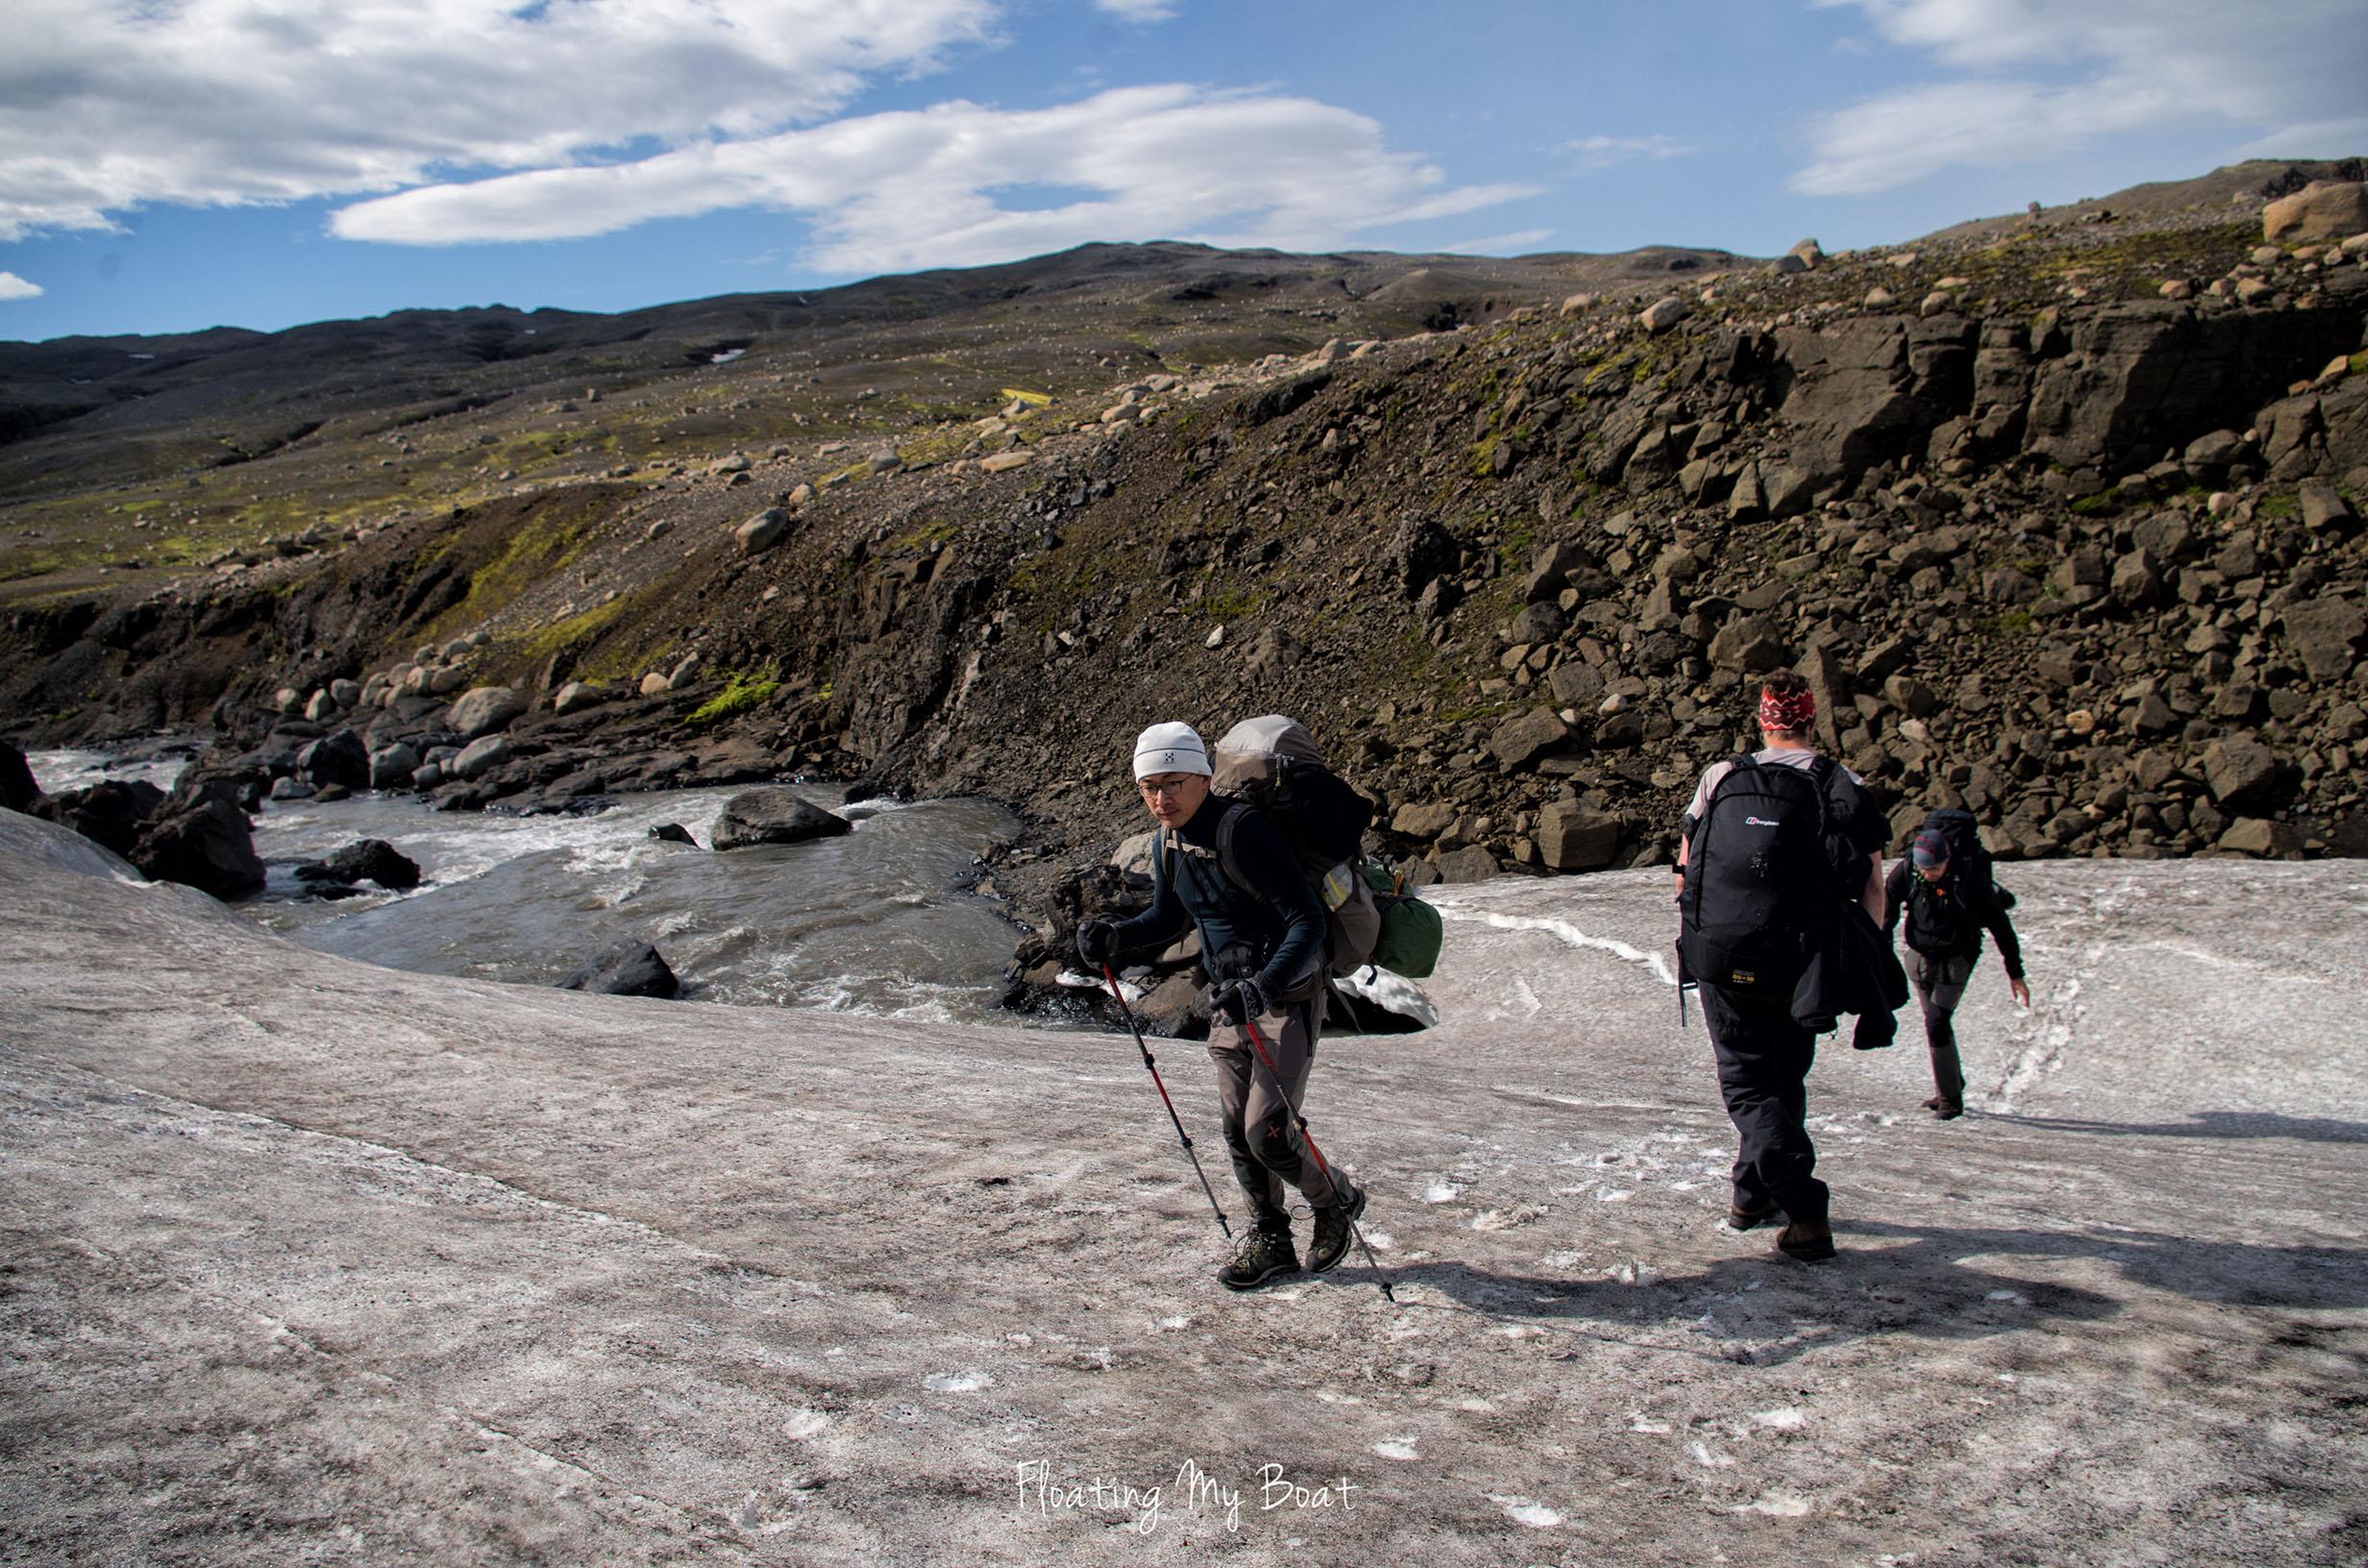 trekking-iceland-vatnajokull-national-park-33